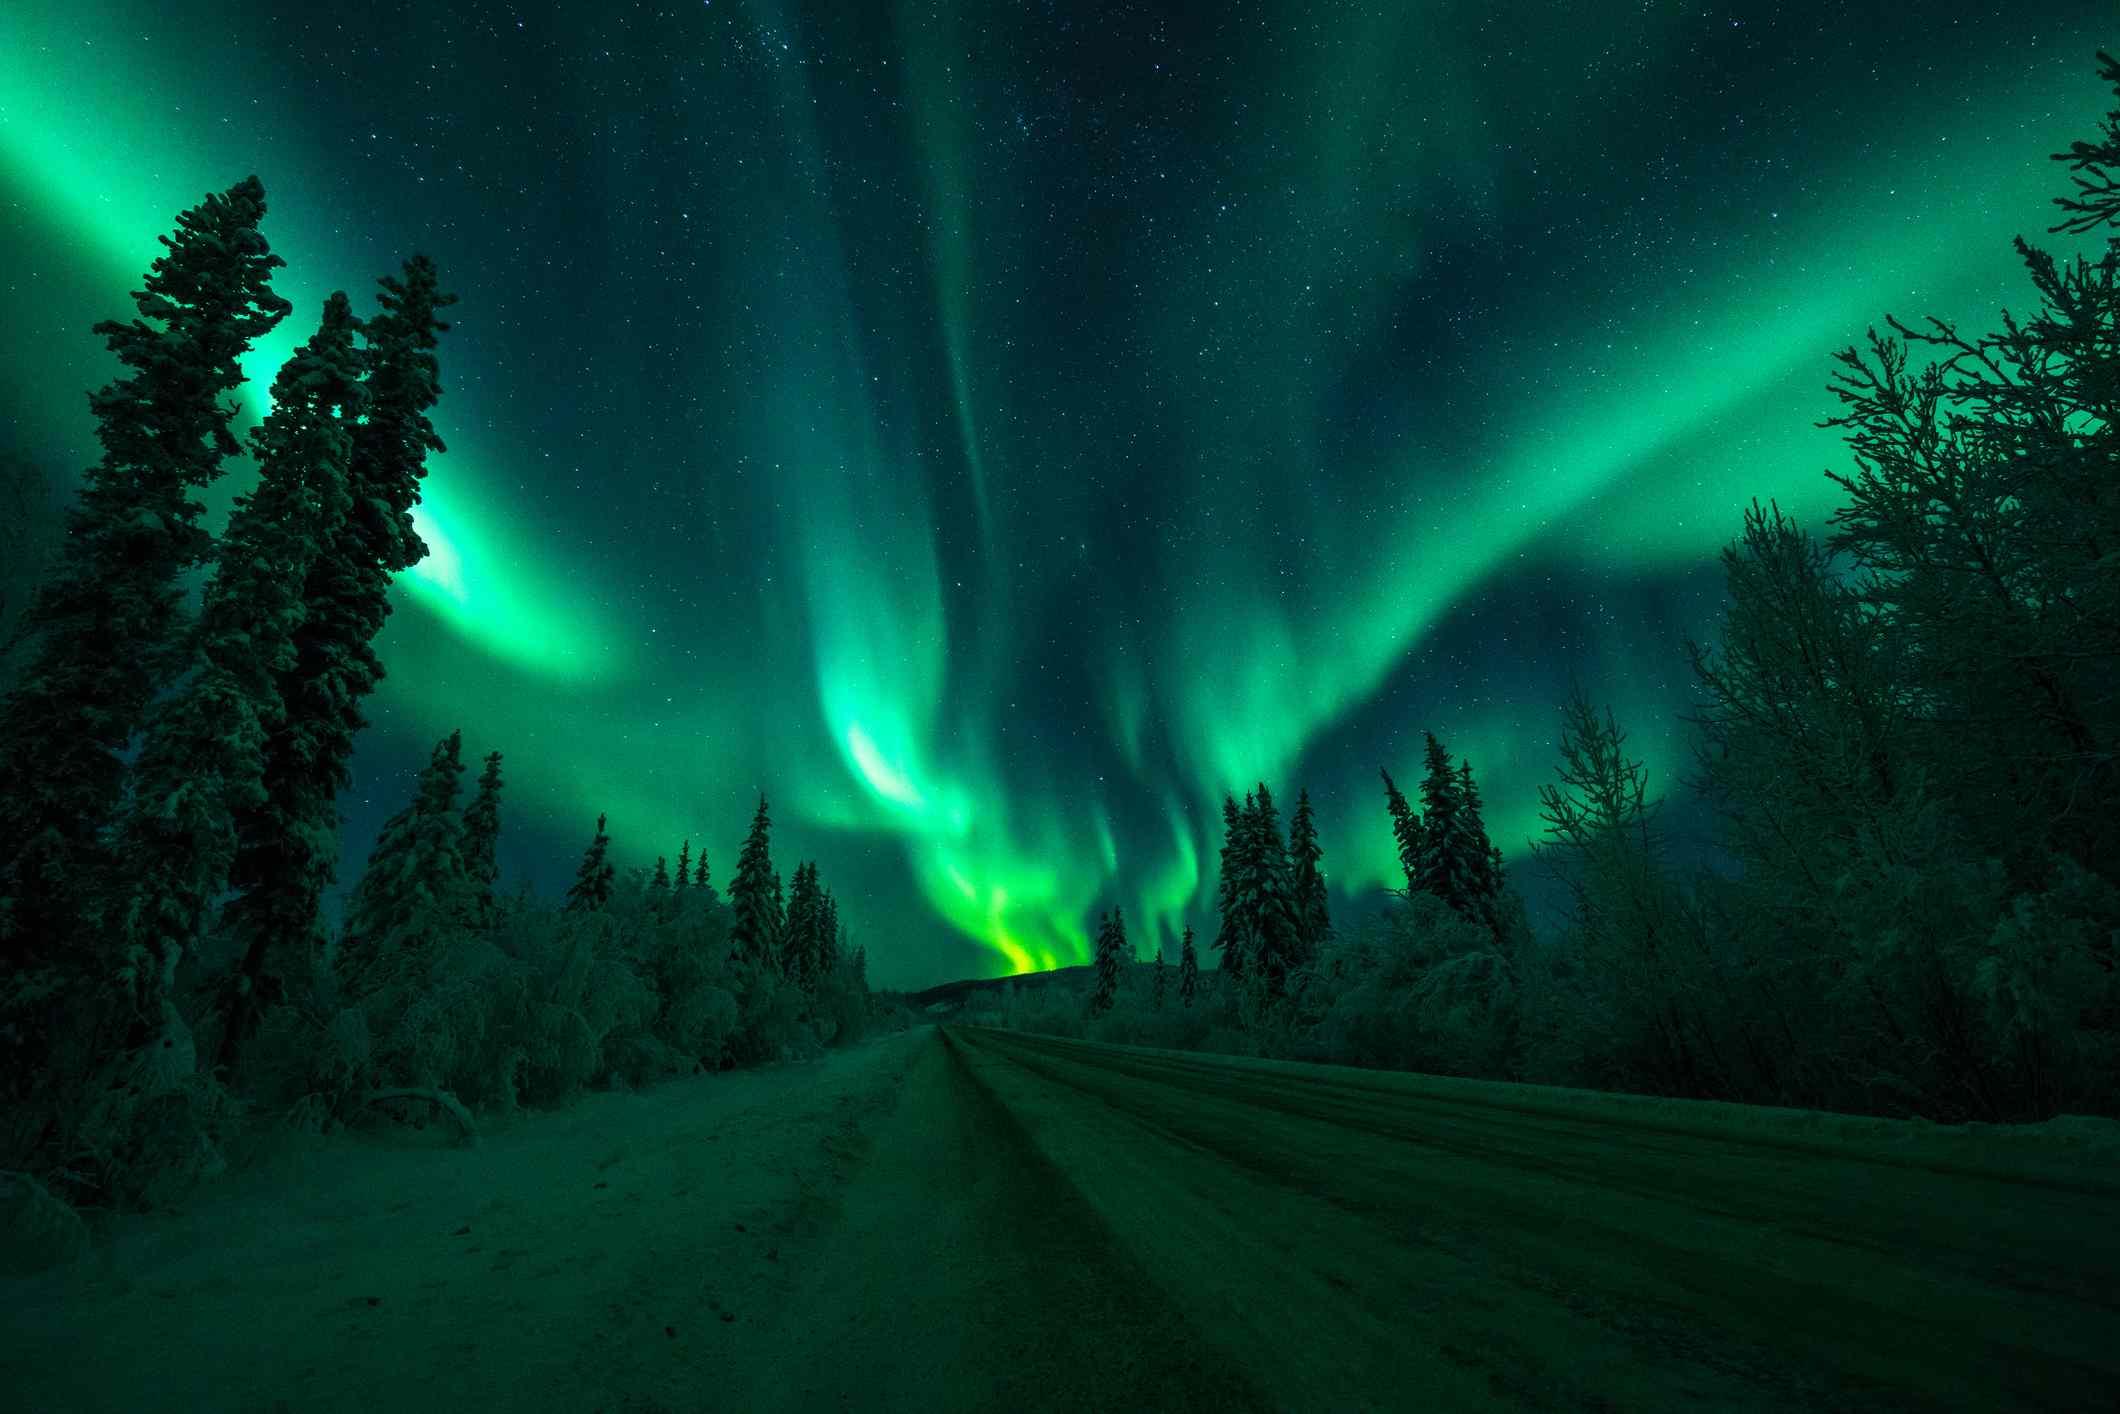 Beautiful view of the Aurora Borealis